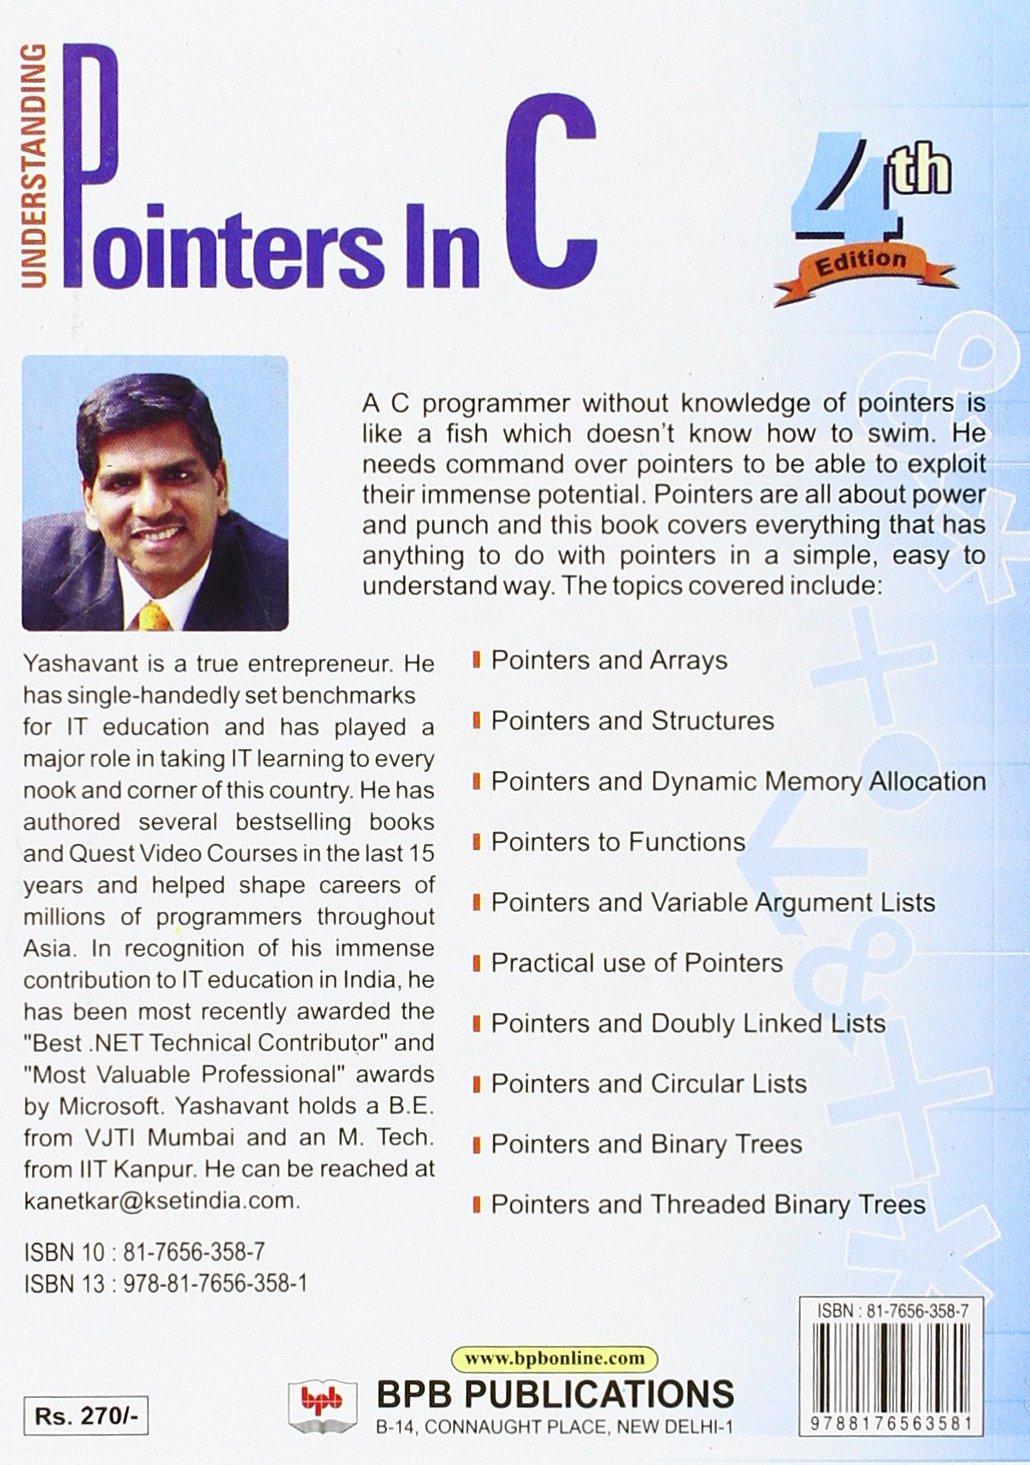 Pointers In C Yashwant Kanetkar Ebook